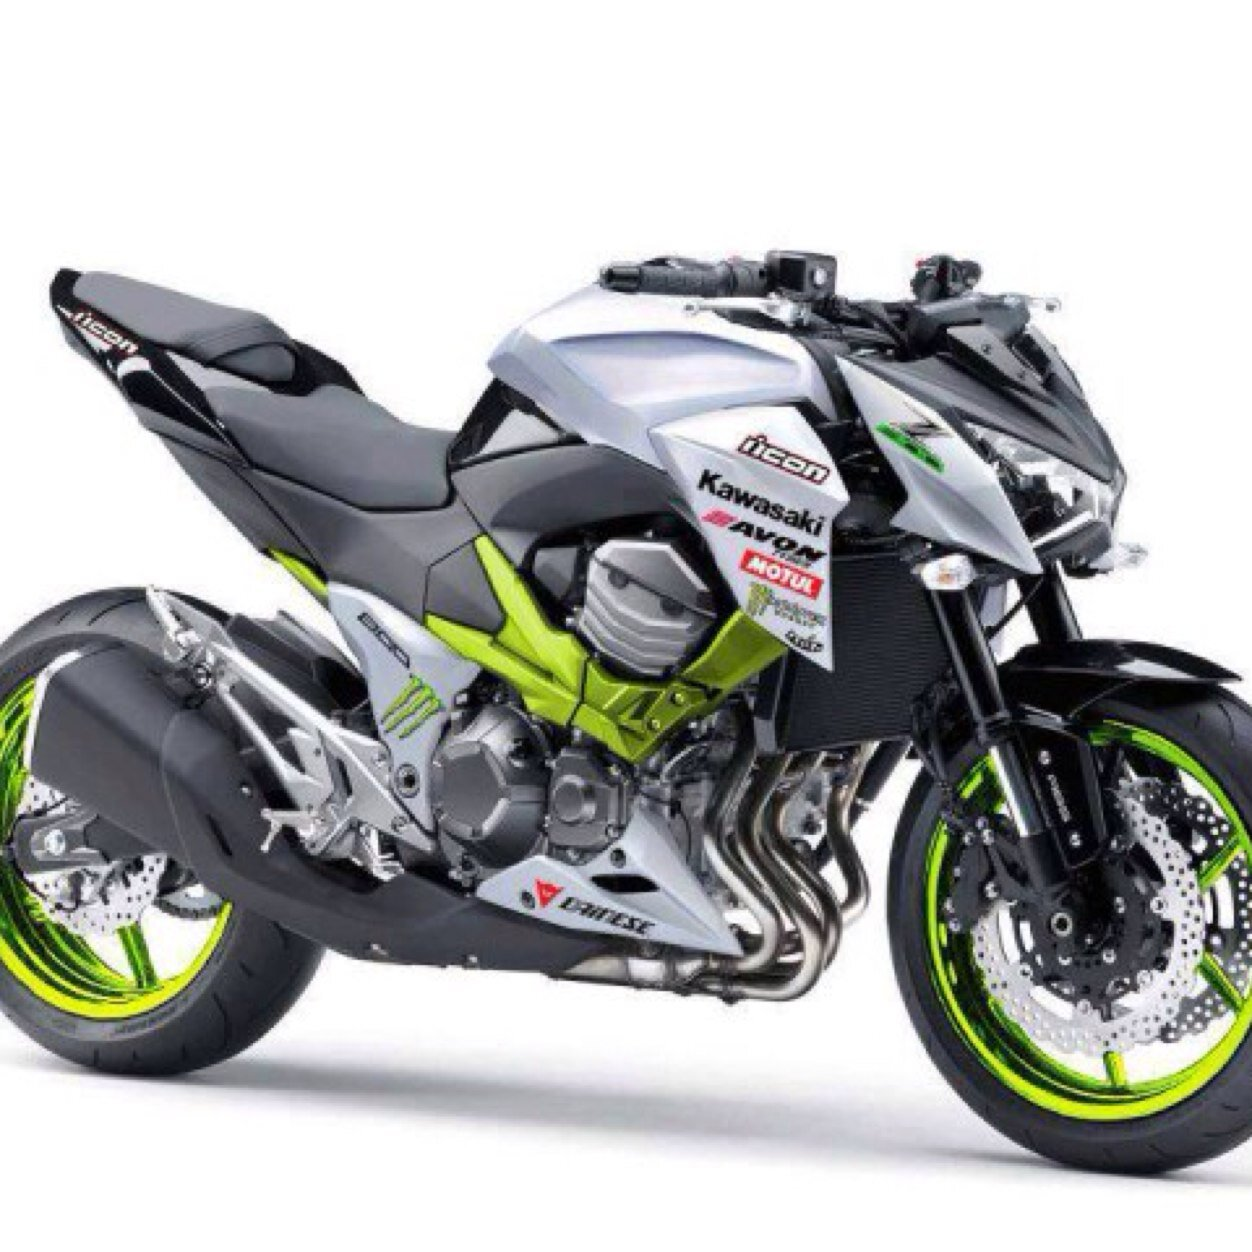 Pro Speed Shark Black Series Kawasaki Ninja N250fi Slip On Daftar Prospeed Suzuki Satria Full Gp21 Motorshop